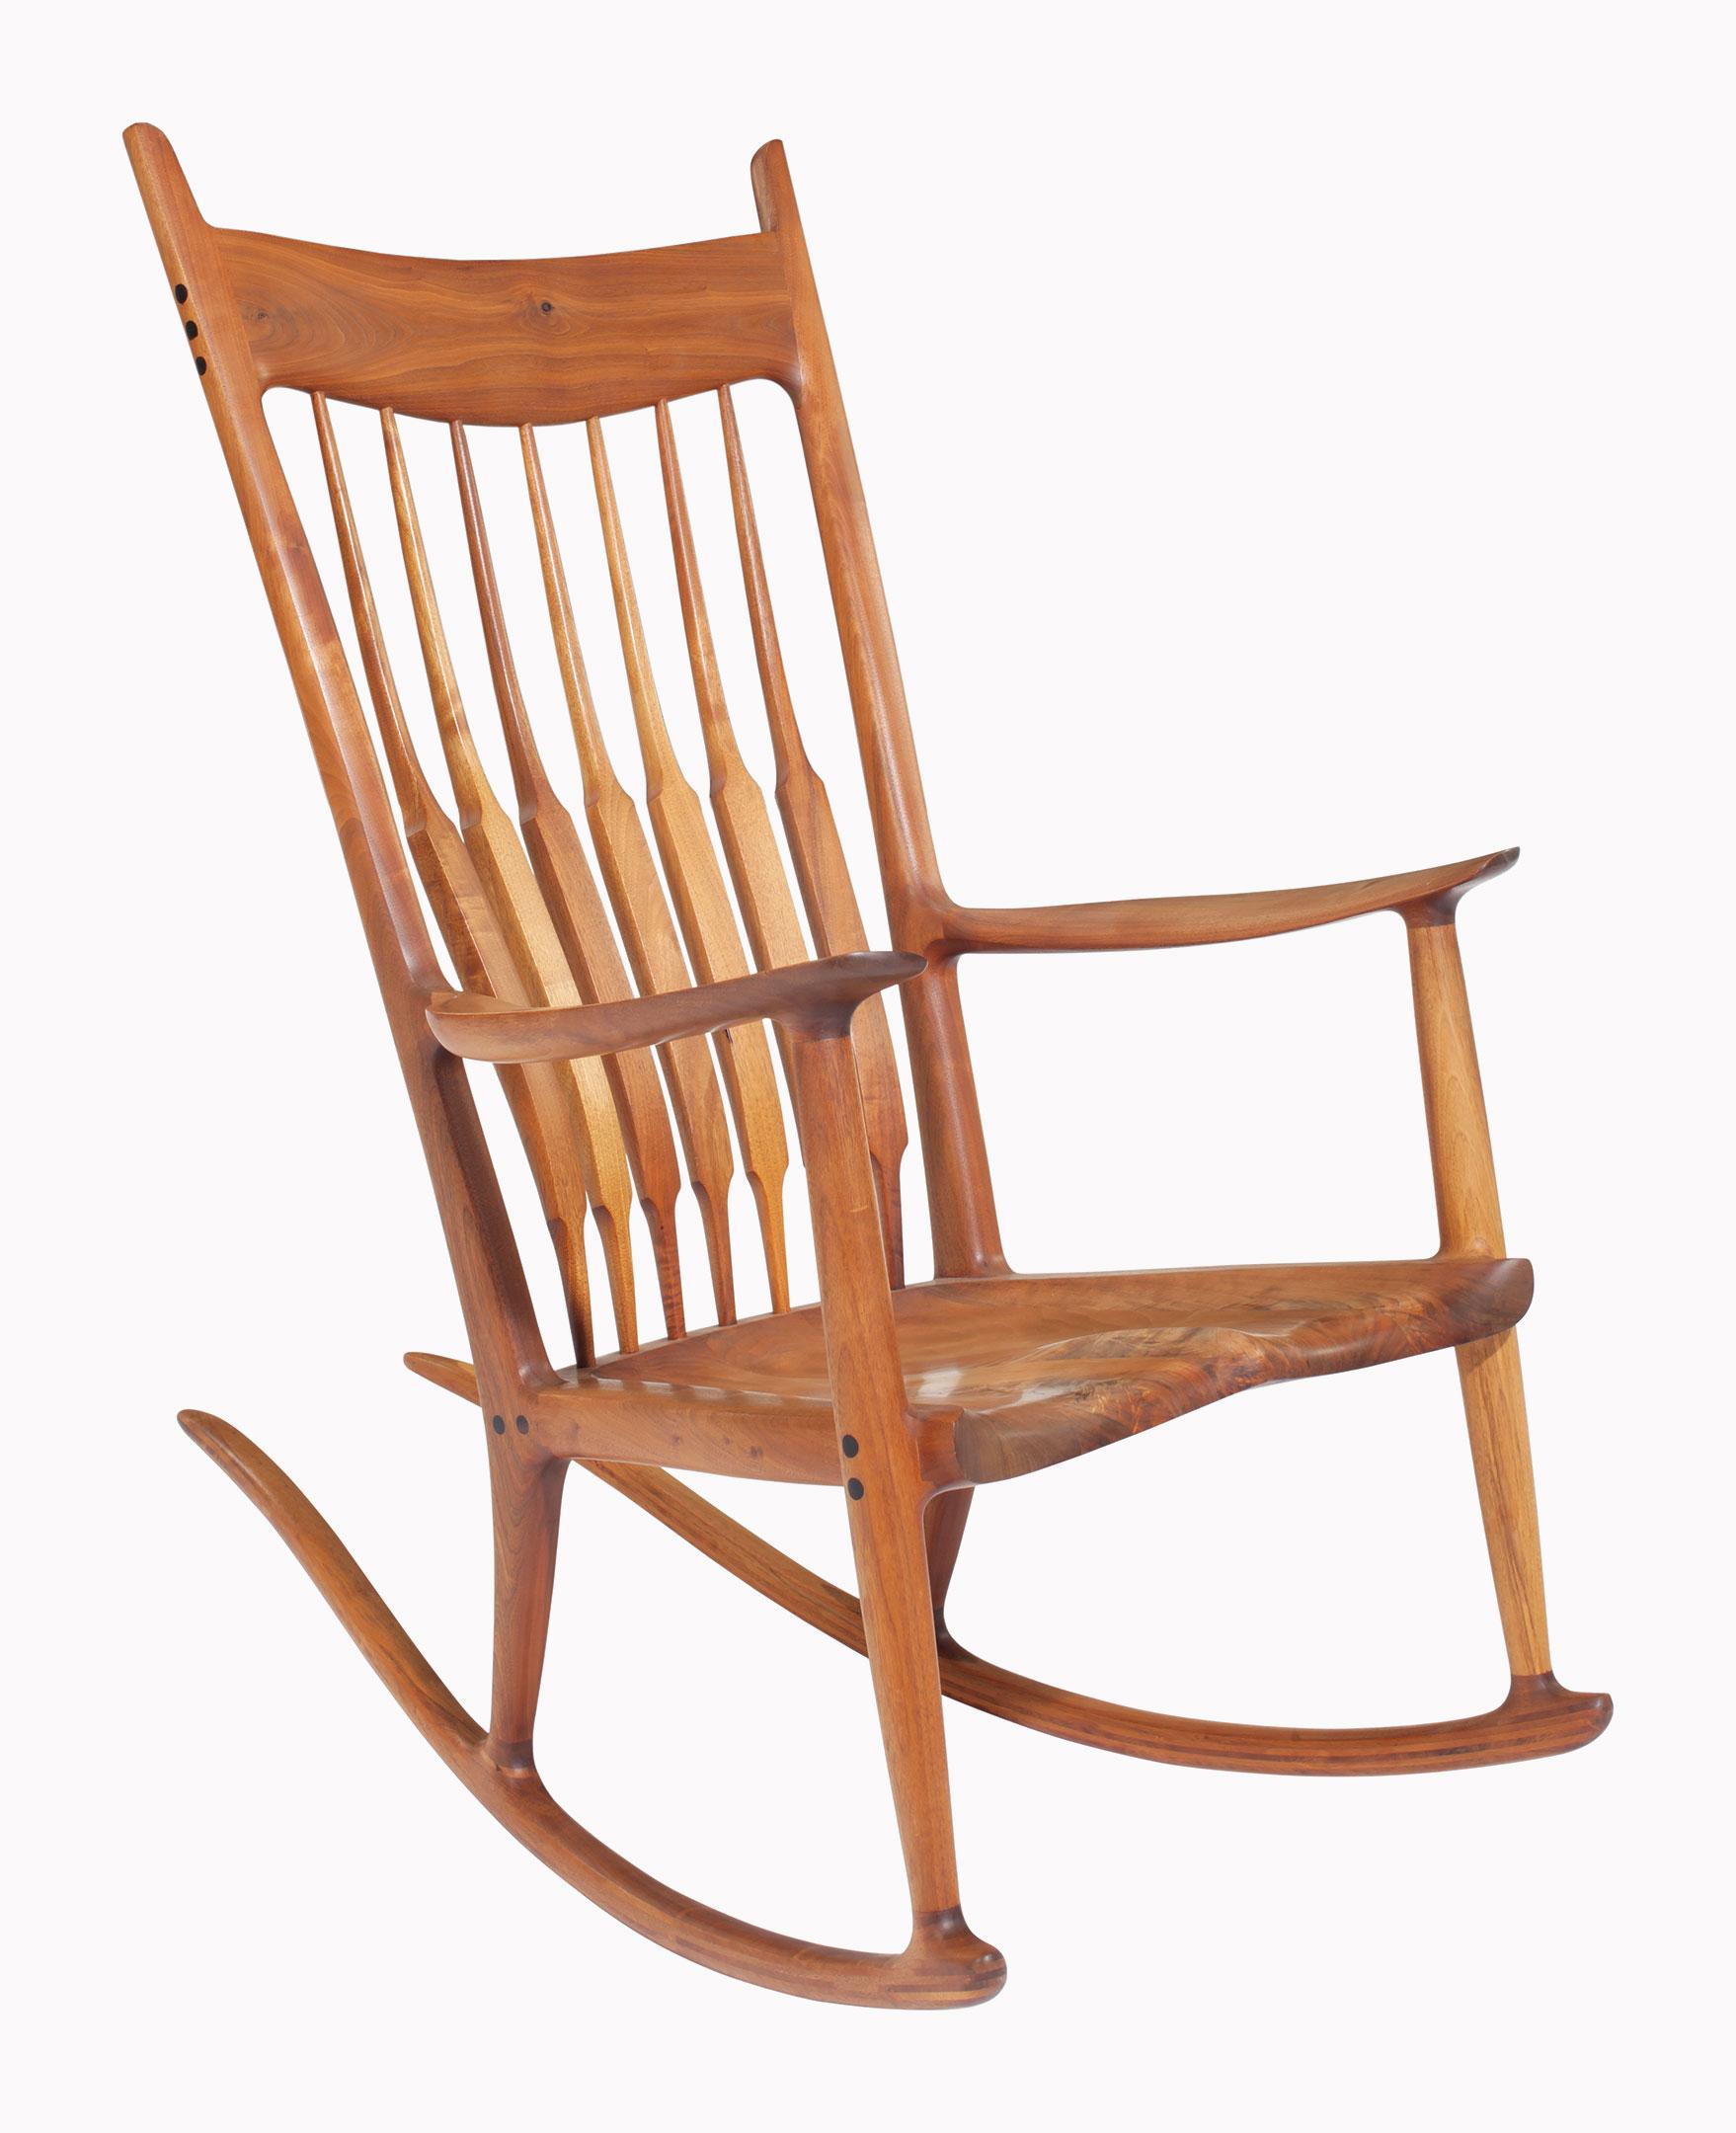 Sam Maloof (1916 2009), A Rocking Chair, 1980. Walnut,